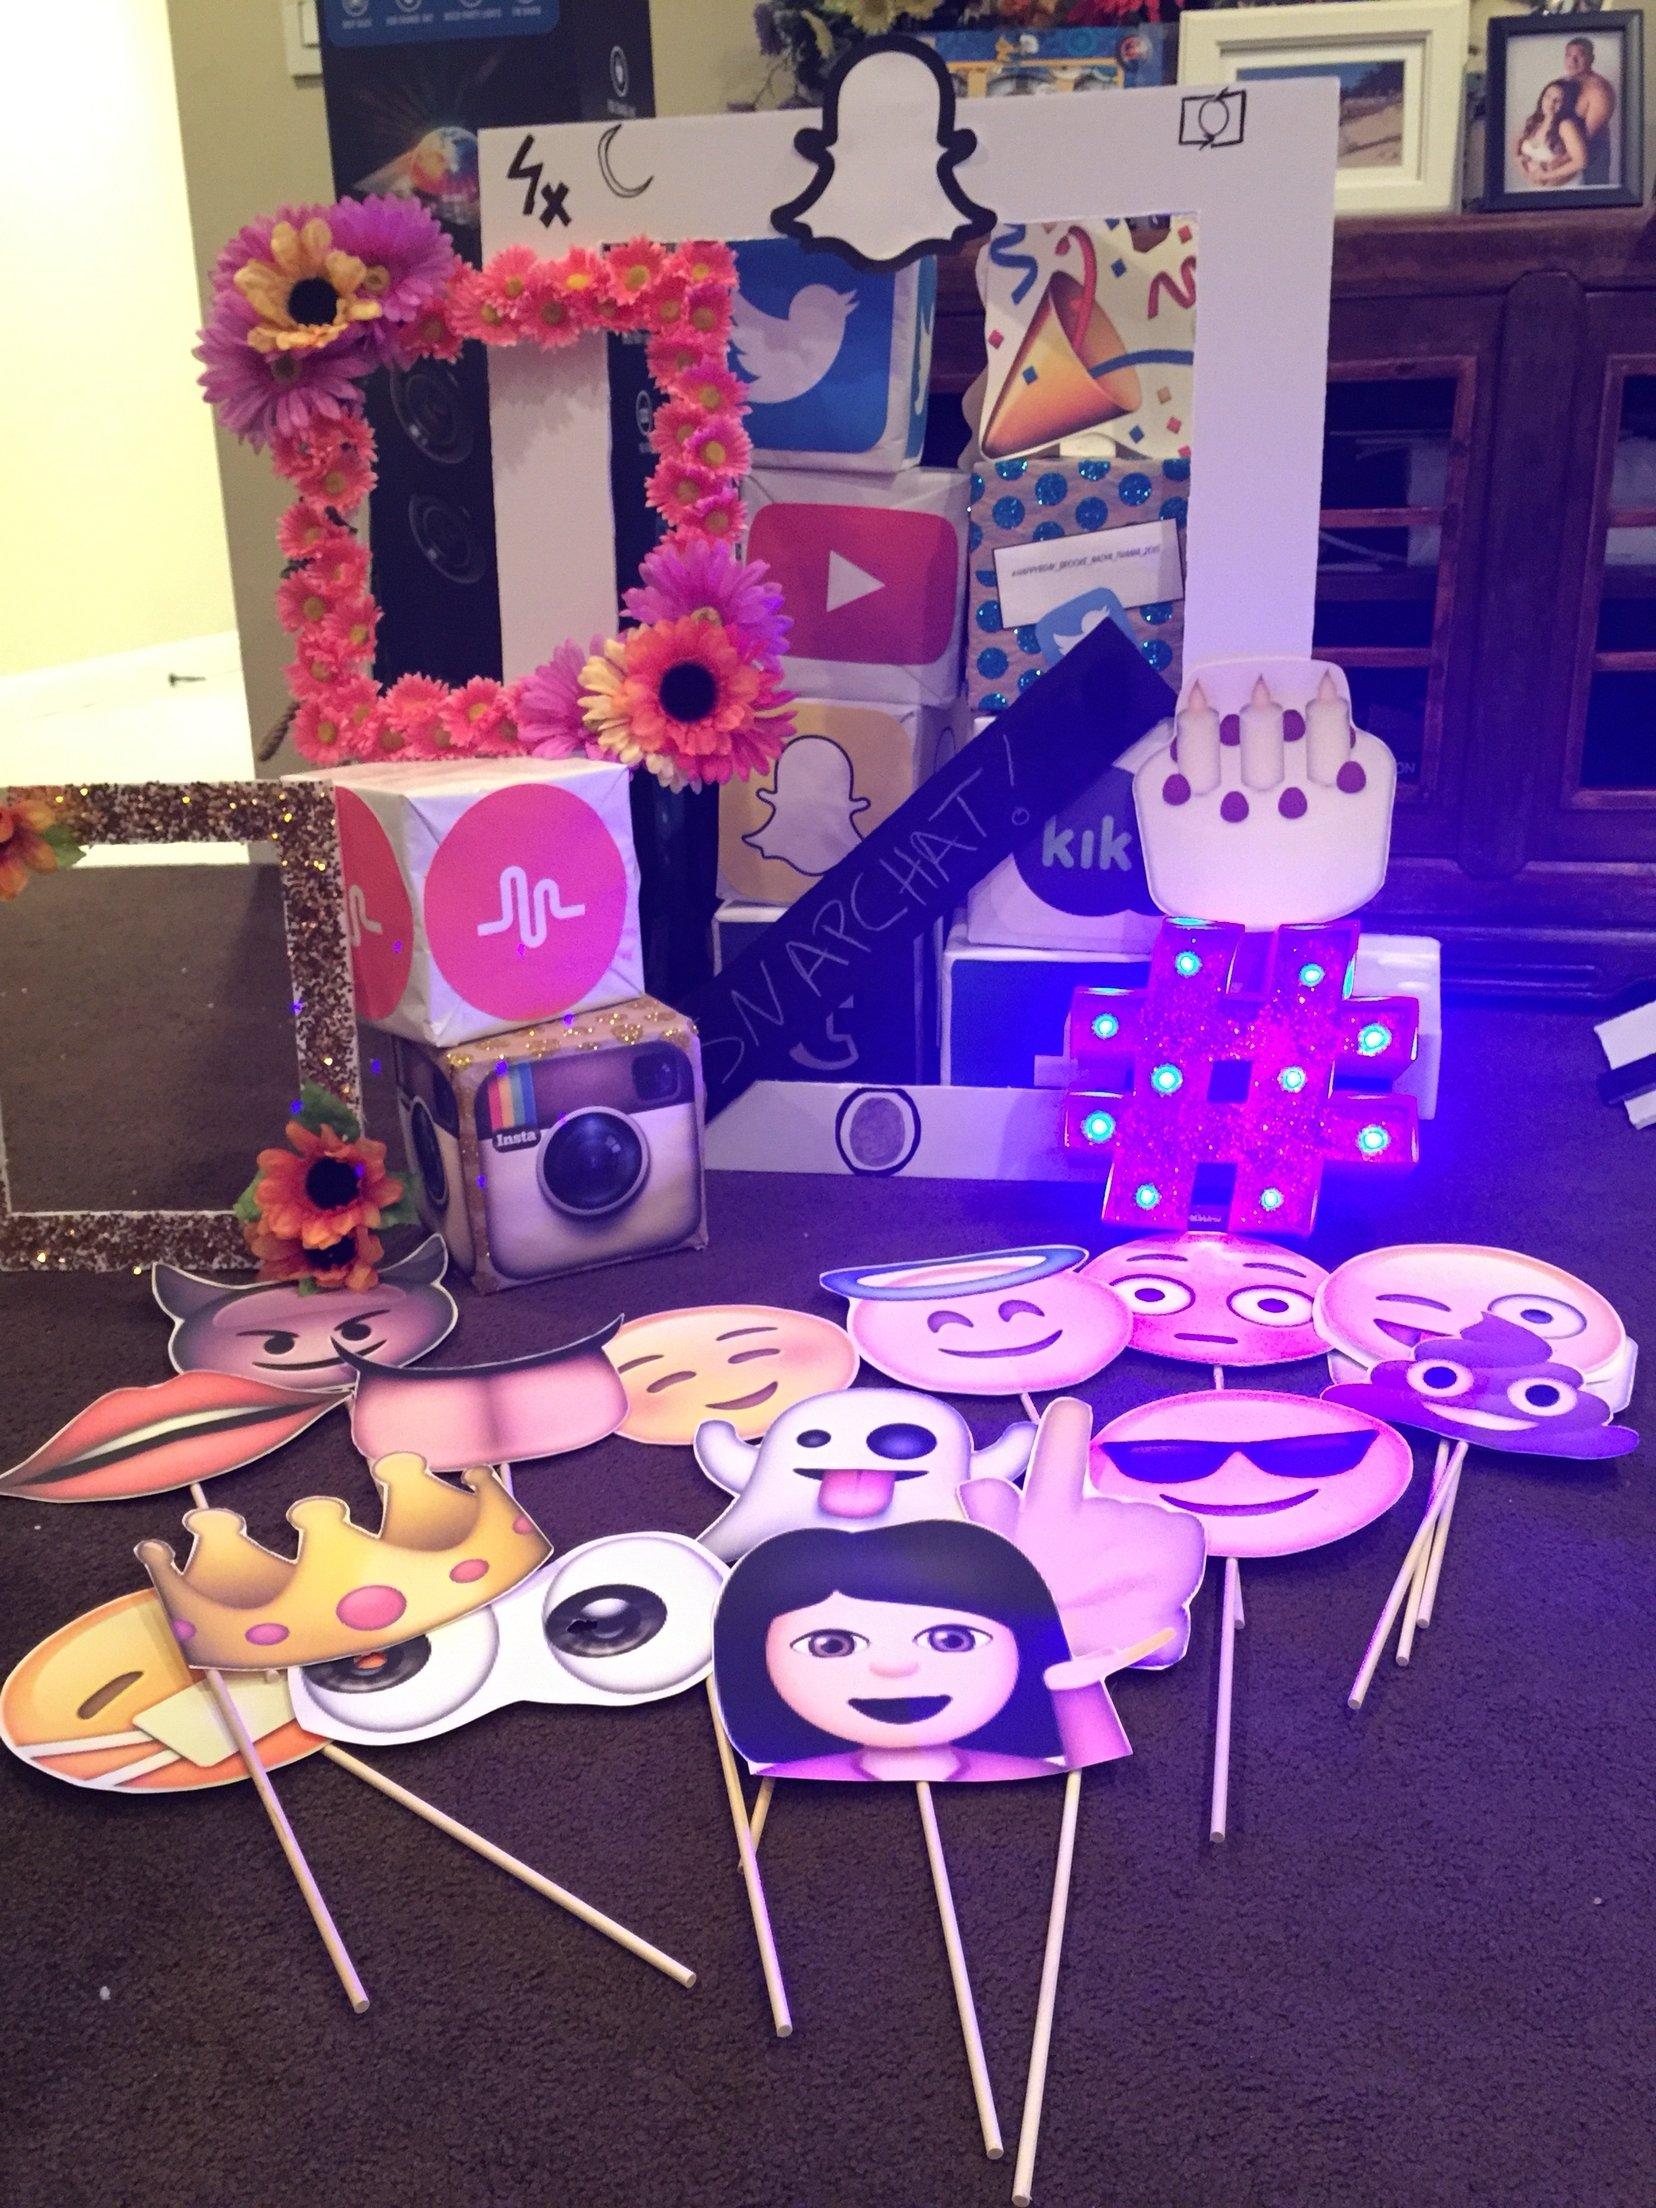 10 Pretty Ideas For A 13Th Birthday Party social media party props i made social media party pinterest 5 2021